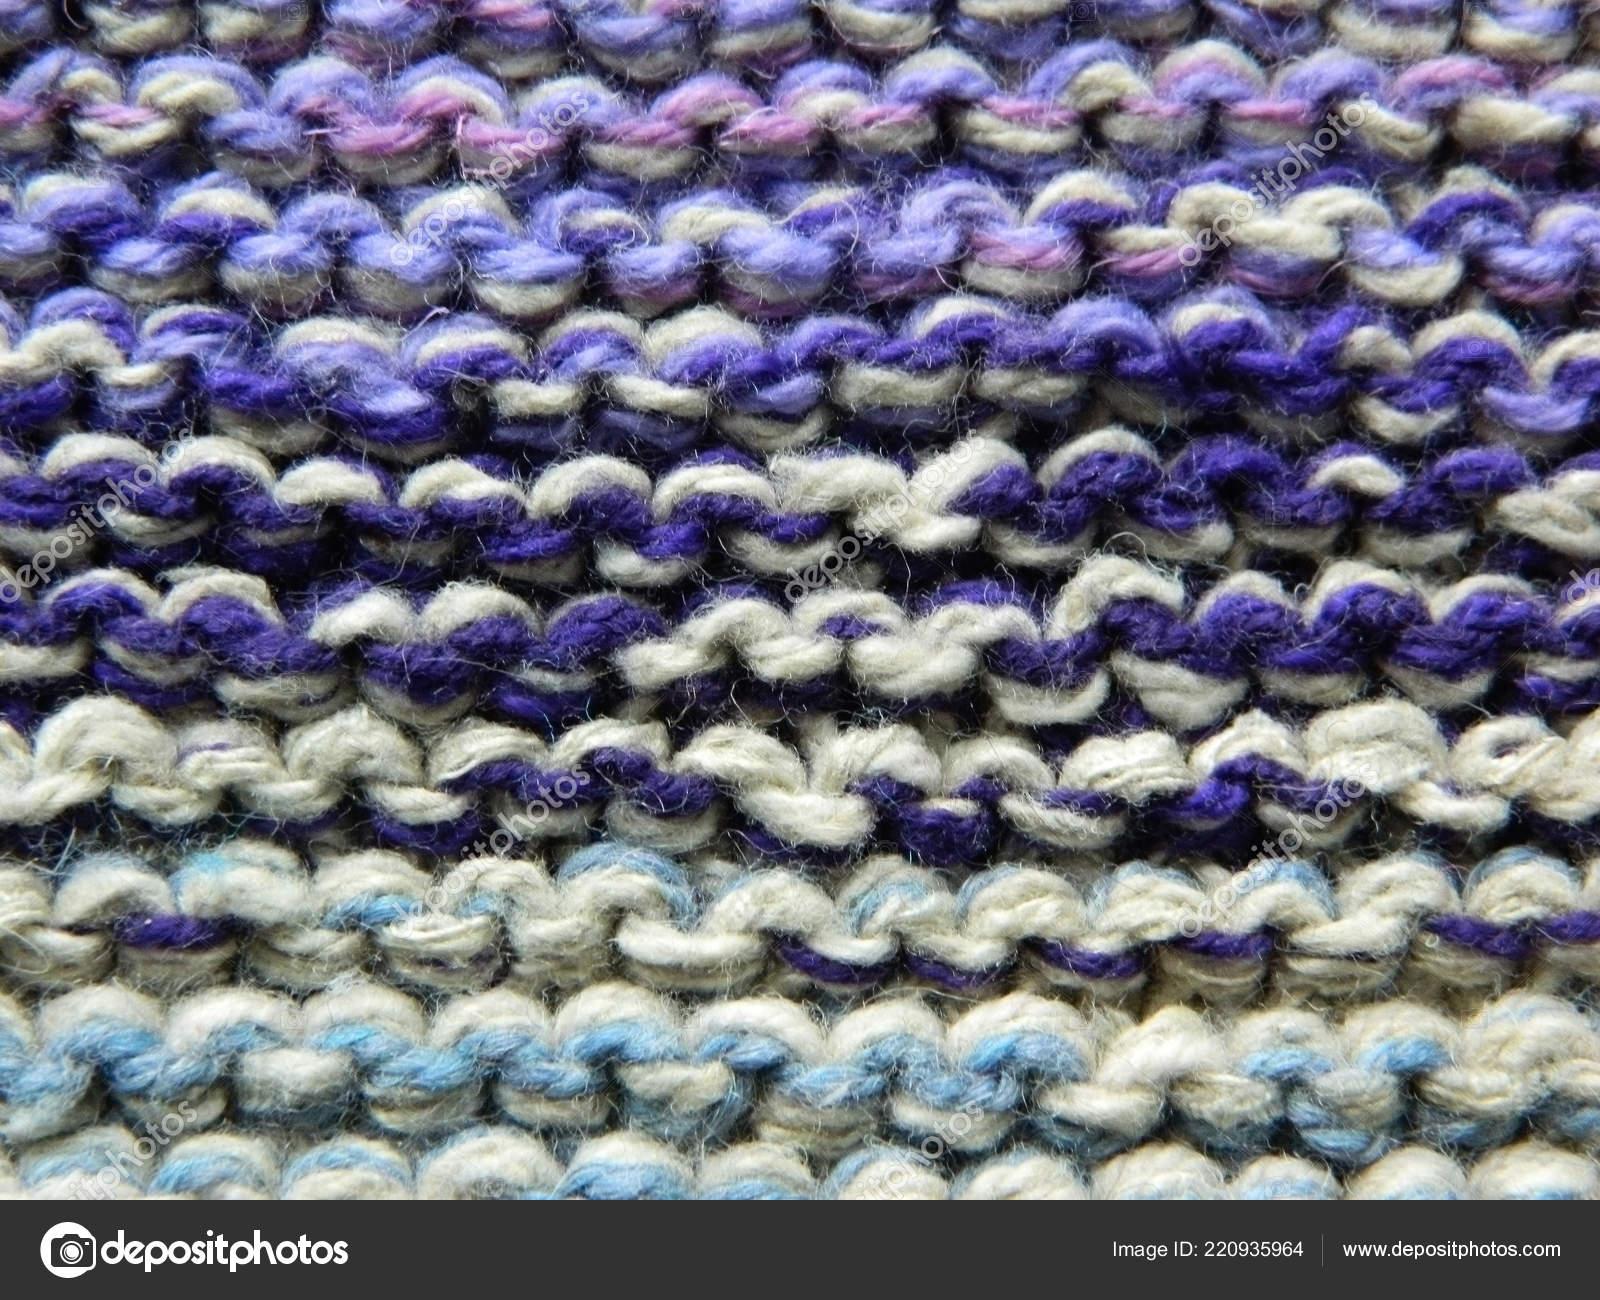 fa5b4e09cf Πλεκτό Πλέξιμο Βελόνες Πλεξίματος Βελονιά Καλτσοδέτα — Φωτογραφία Αρχείου